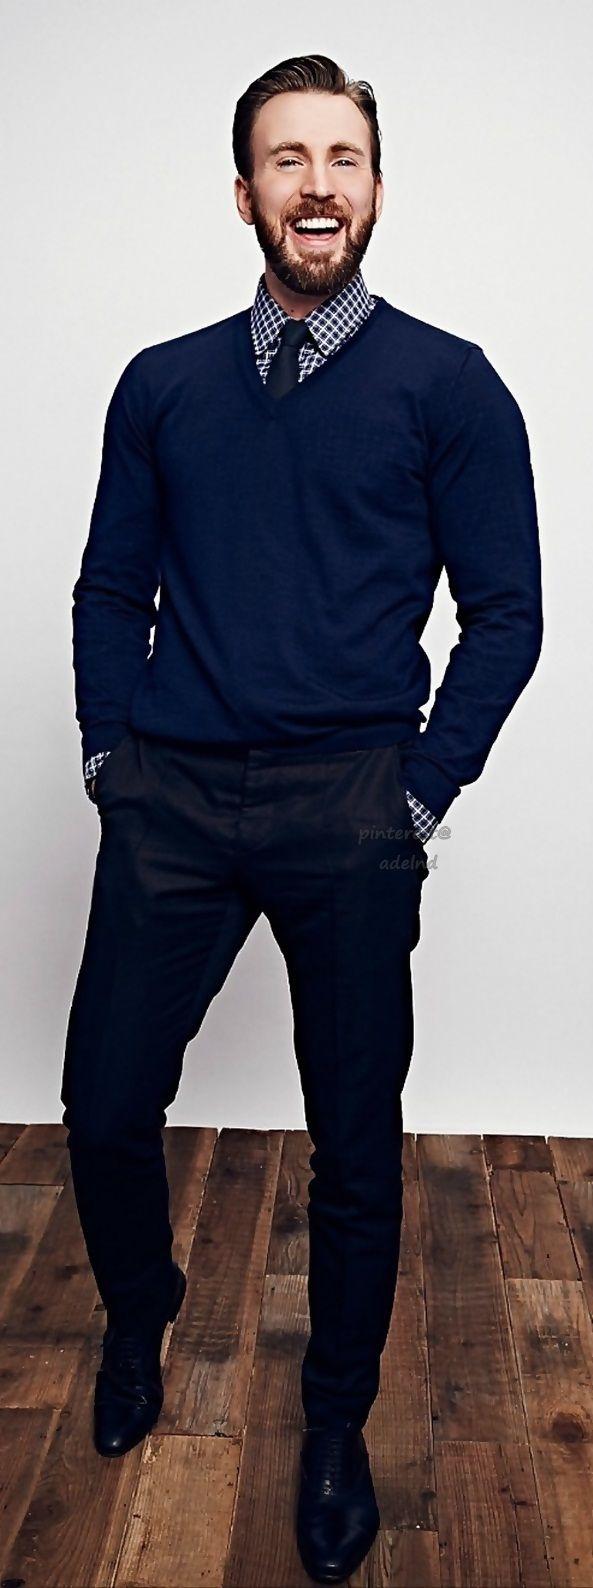 Chris Evans                                                                                                                                                      More